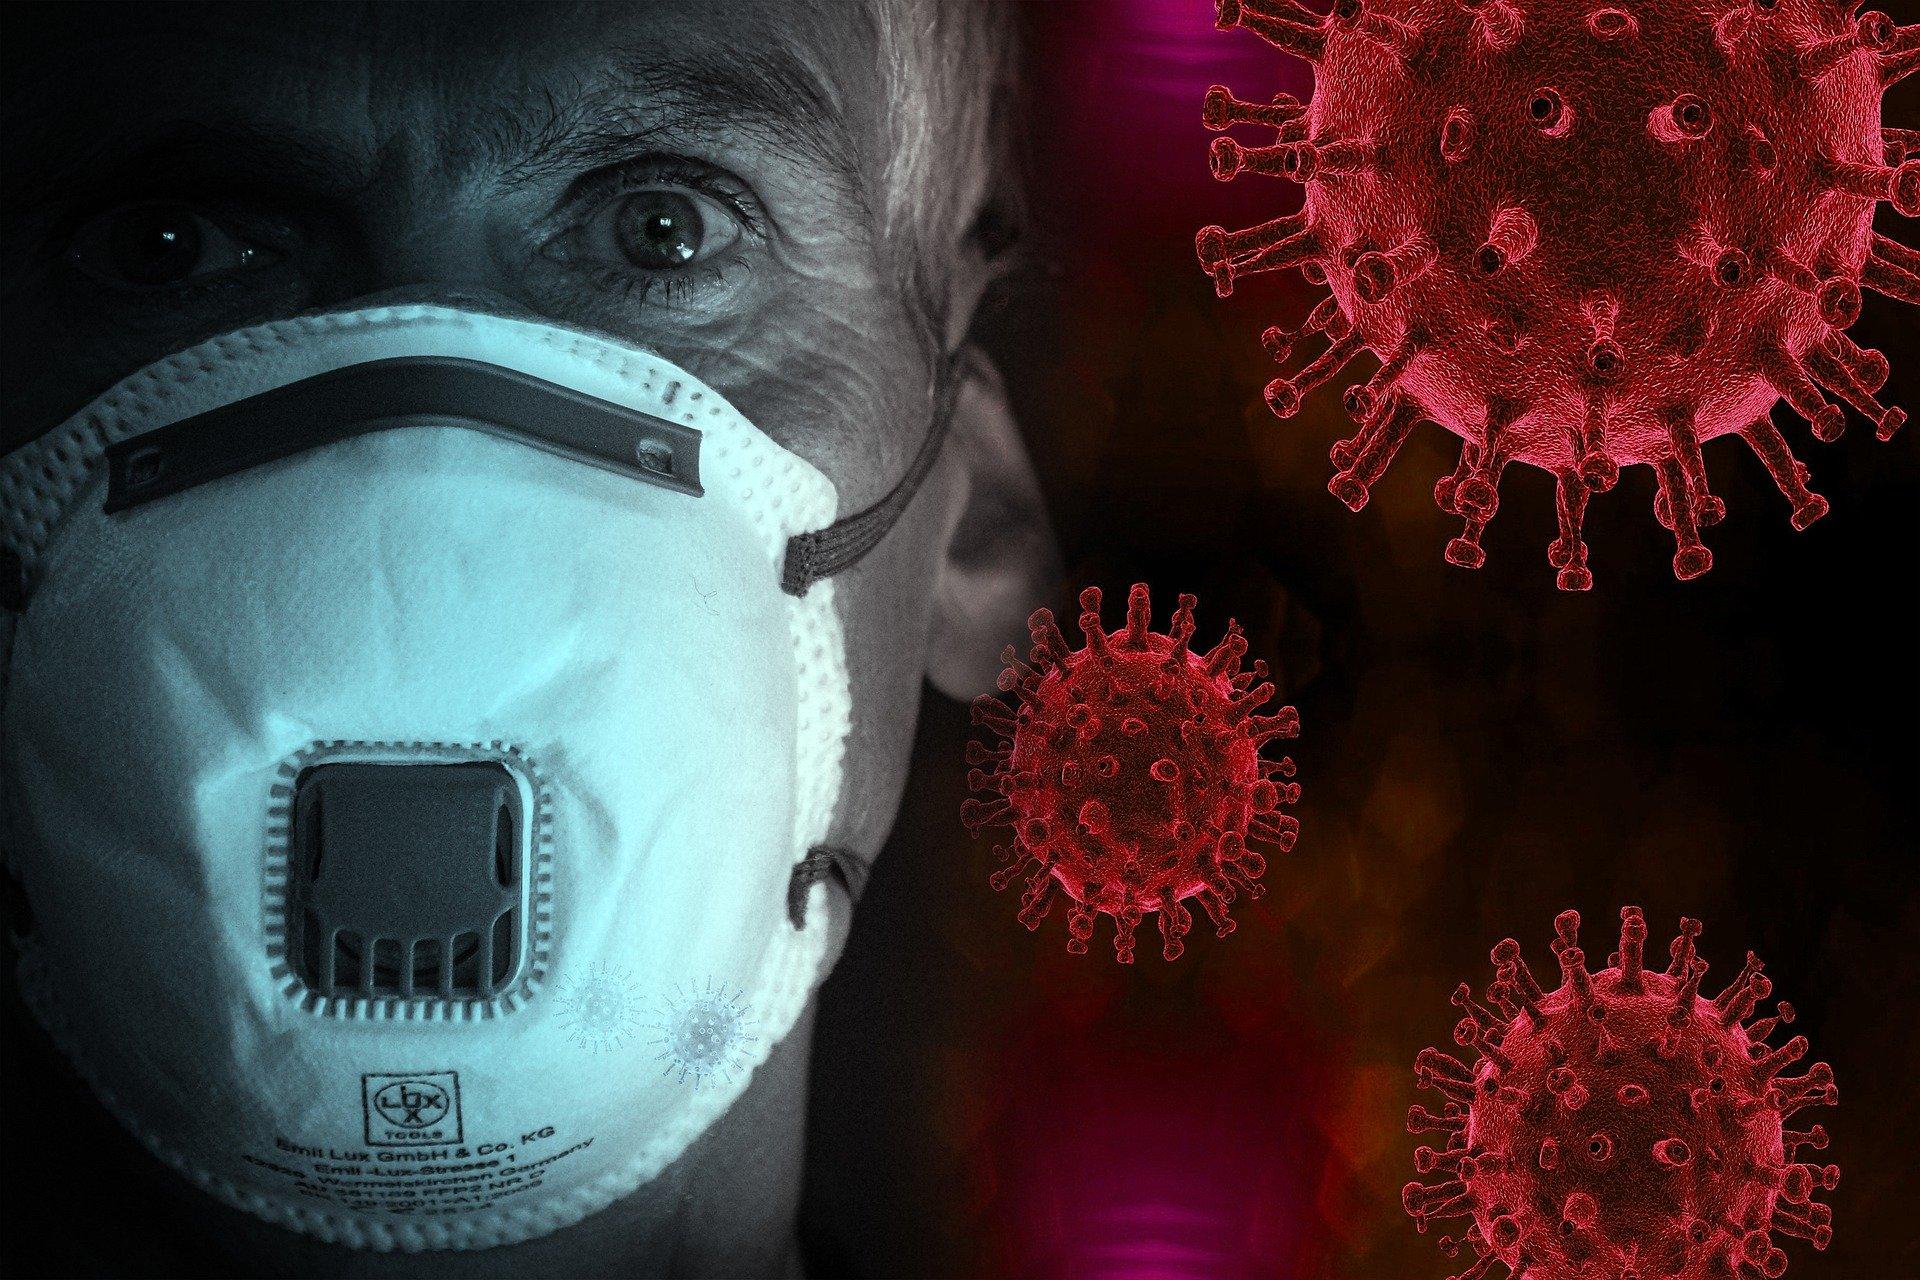 https://img.technews.tw/wp-content/uploads/2020/08/04150923/coronavirus-4957673_1920.jpg